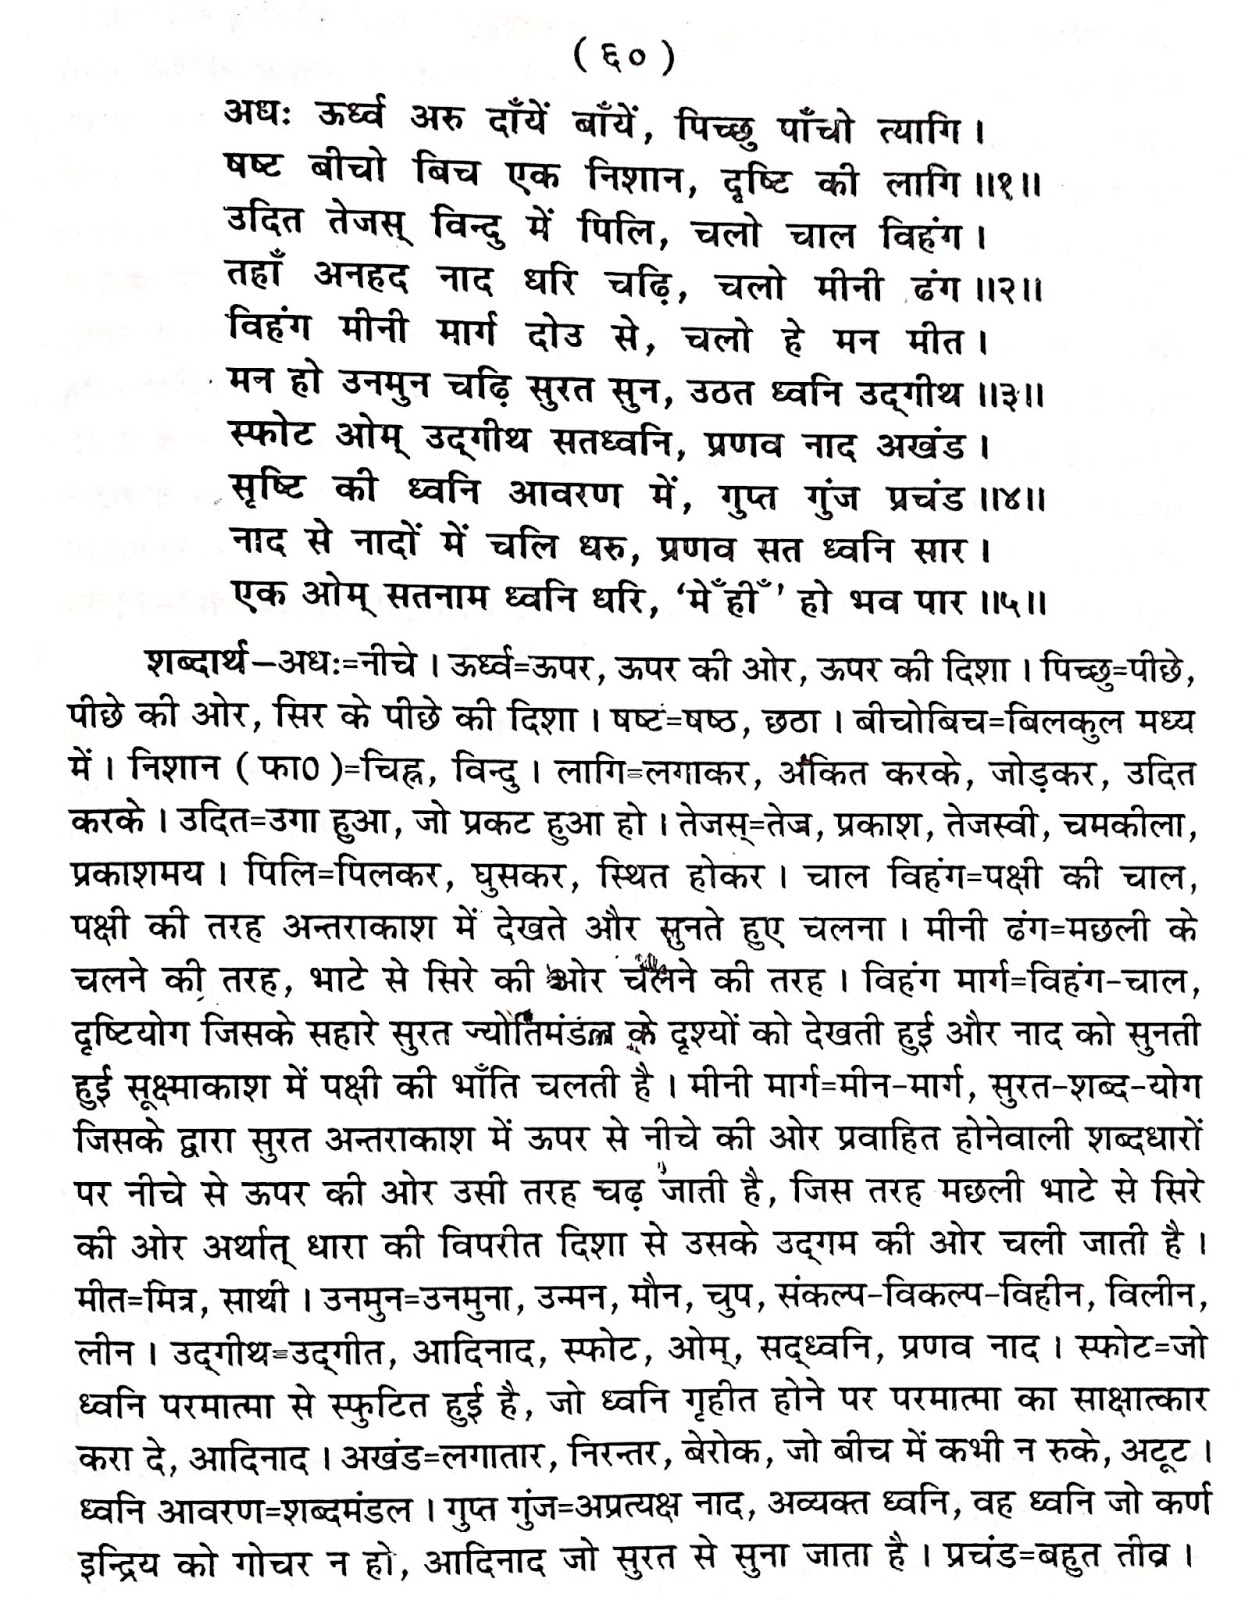 "P60, Complete knowledge of Vindu meditation? ""अध: ऊर्ध्व अरु दांएं बांएं।..."" महर्षि मेंहीं पदावली अर्थ सहित। पदावली भजन 60 और शब्दार्थ। विंदु ध्यान।"